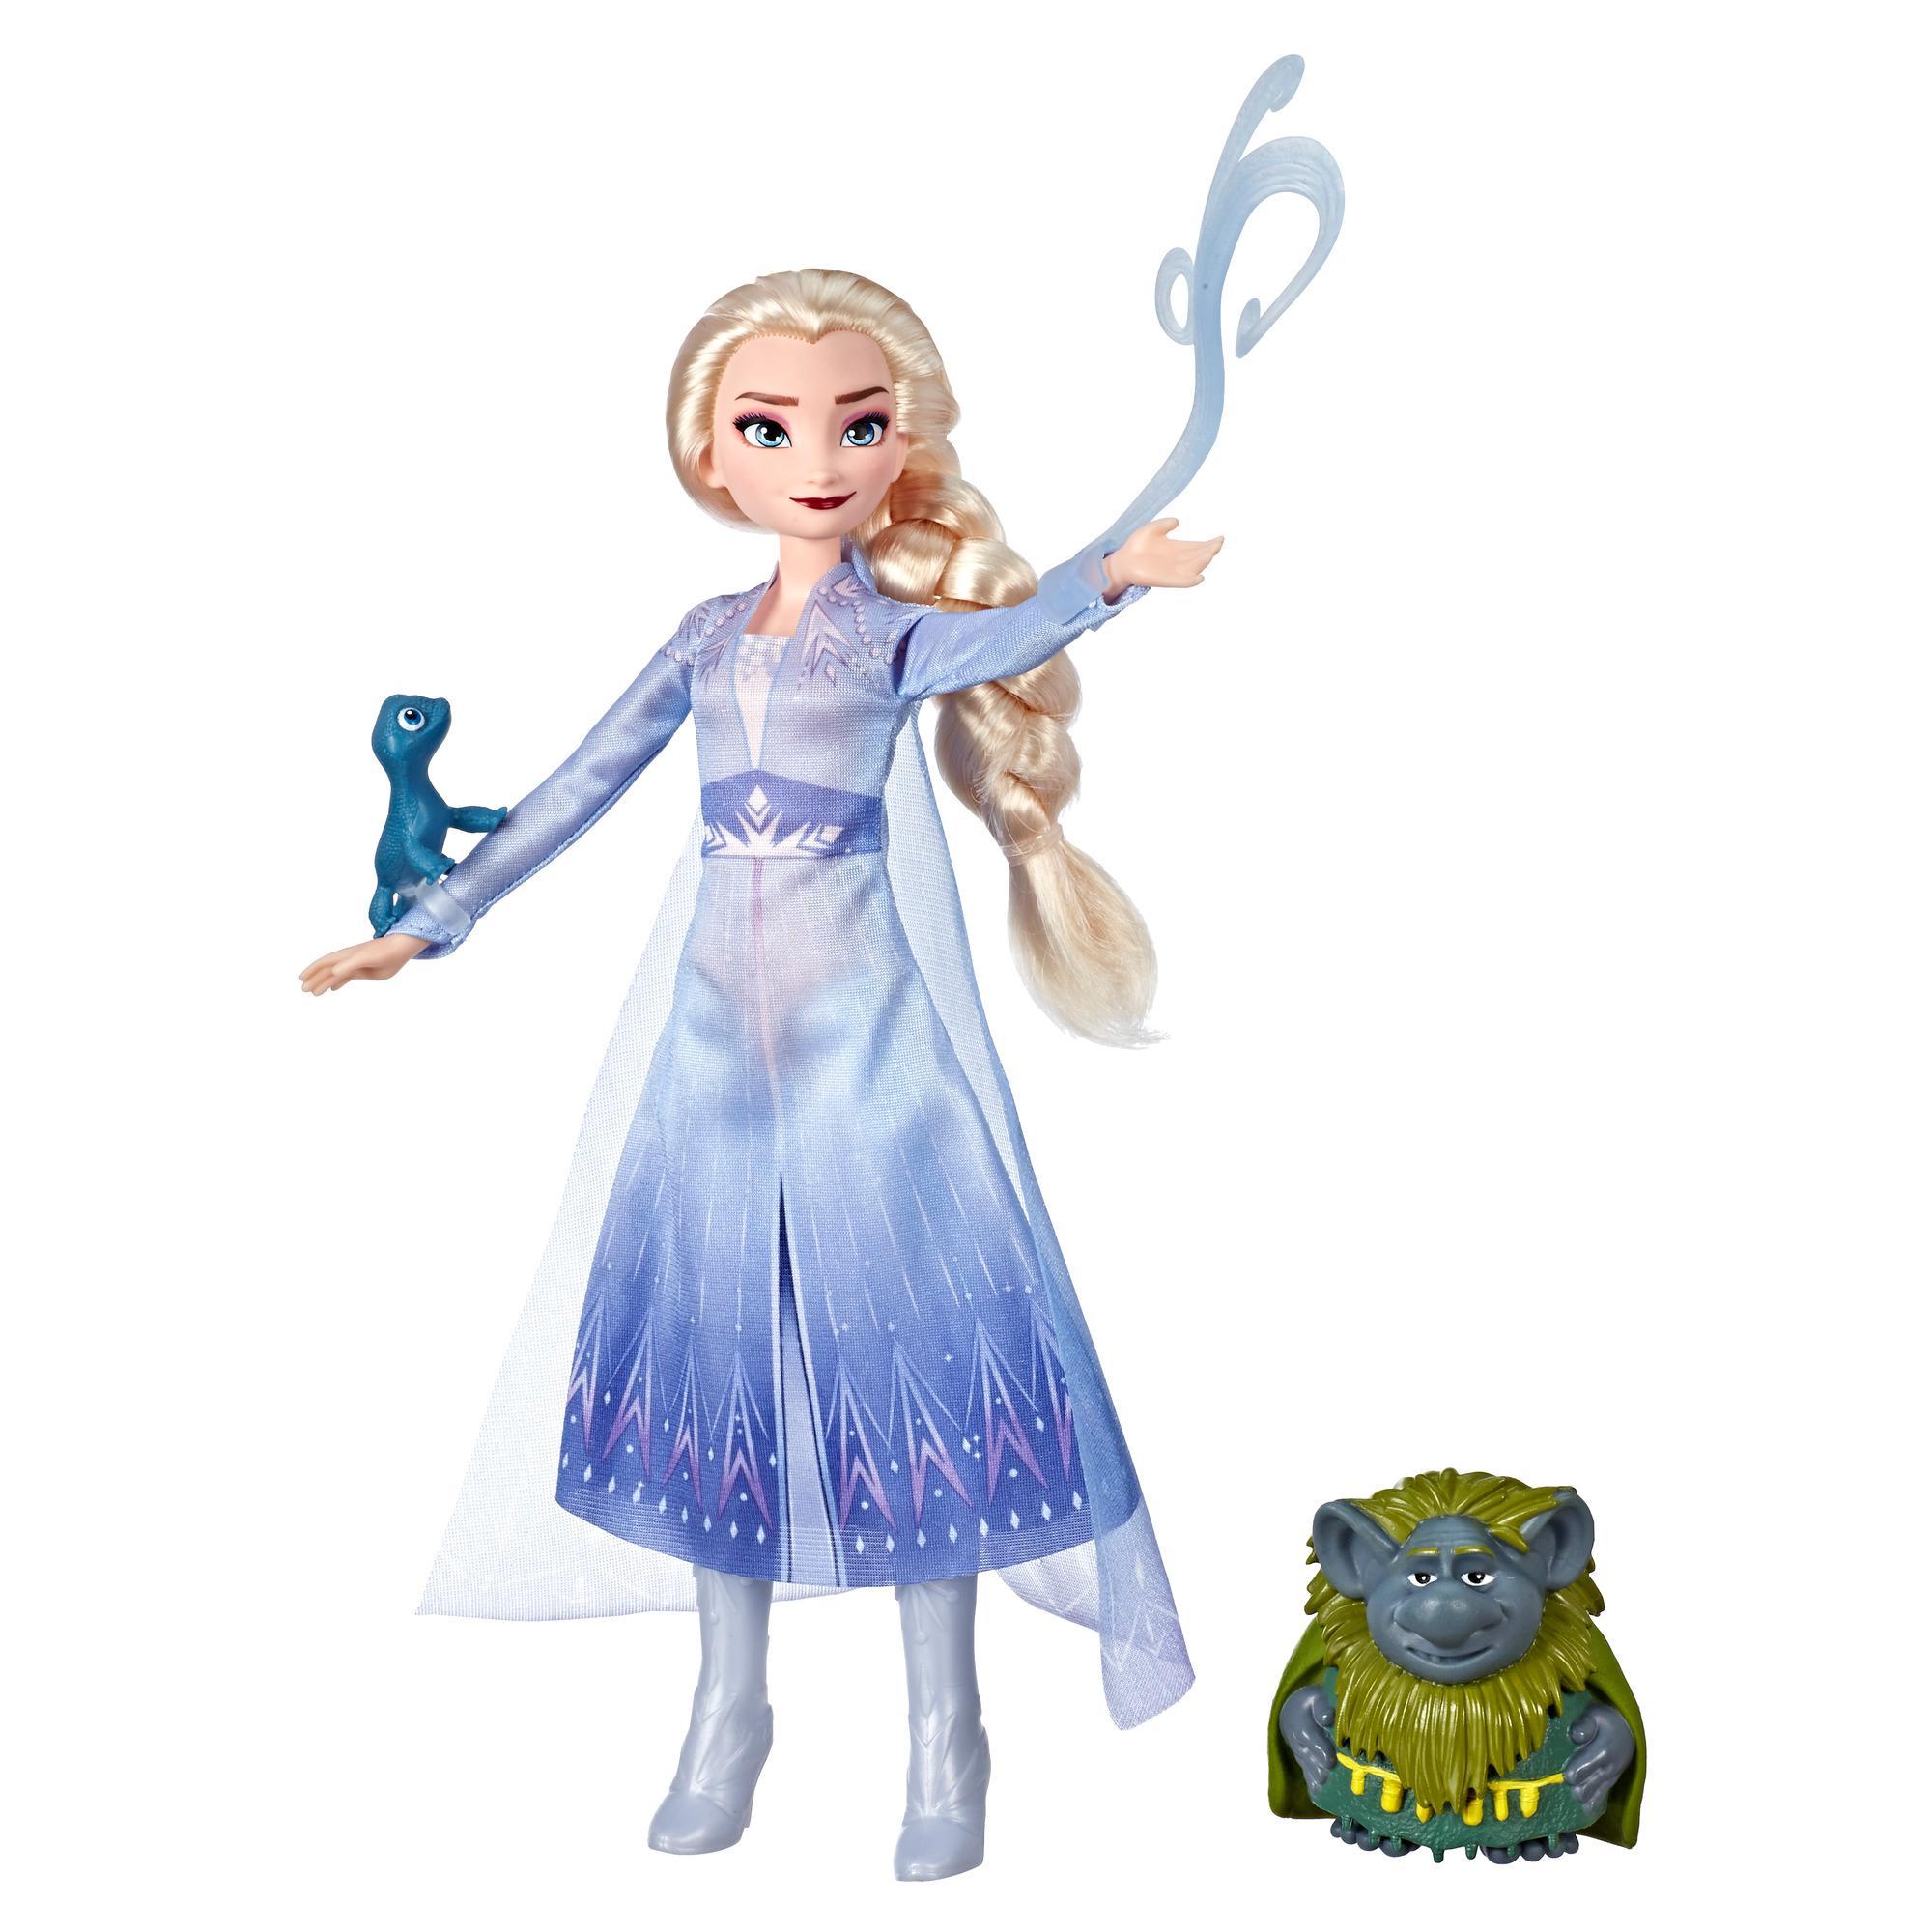 Frozen 2: Η Έλσα και οι νέοι φίλοι της